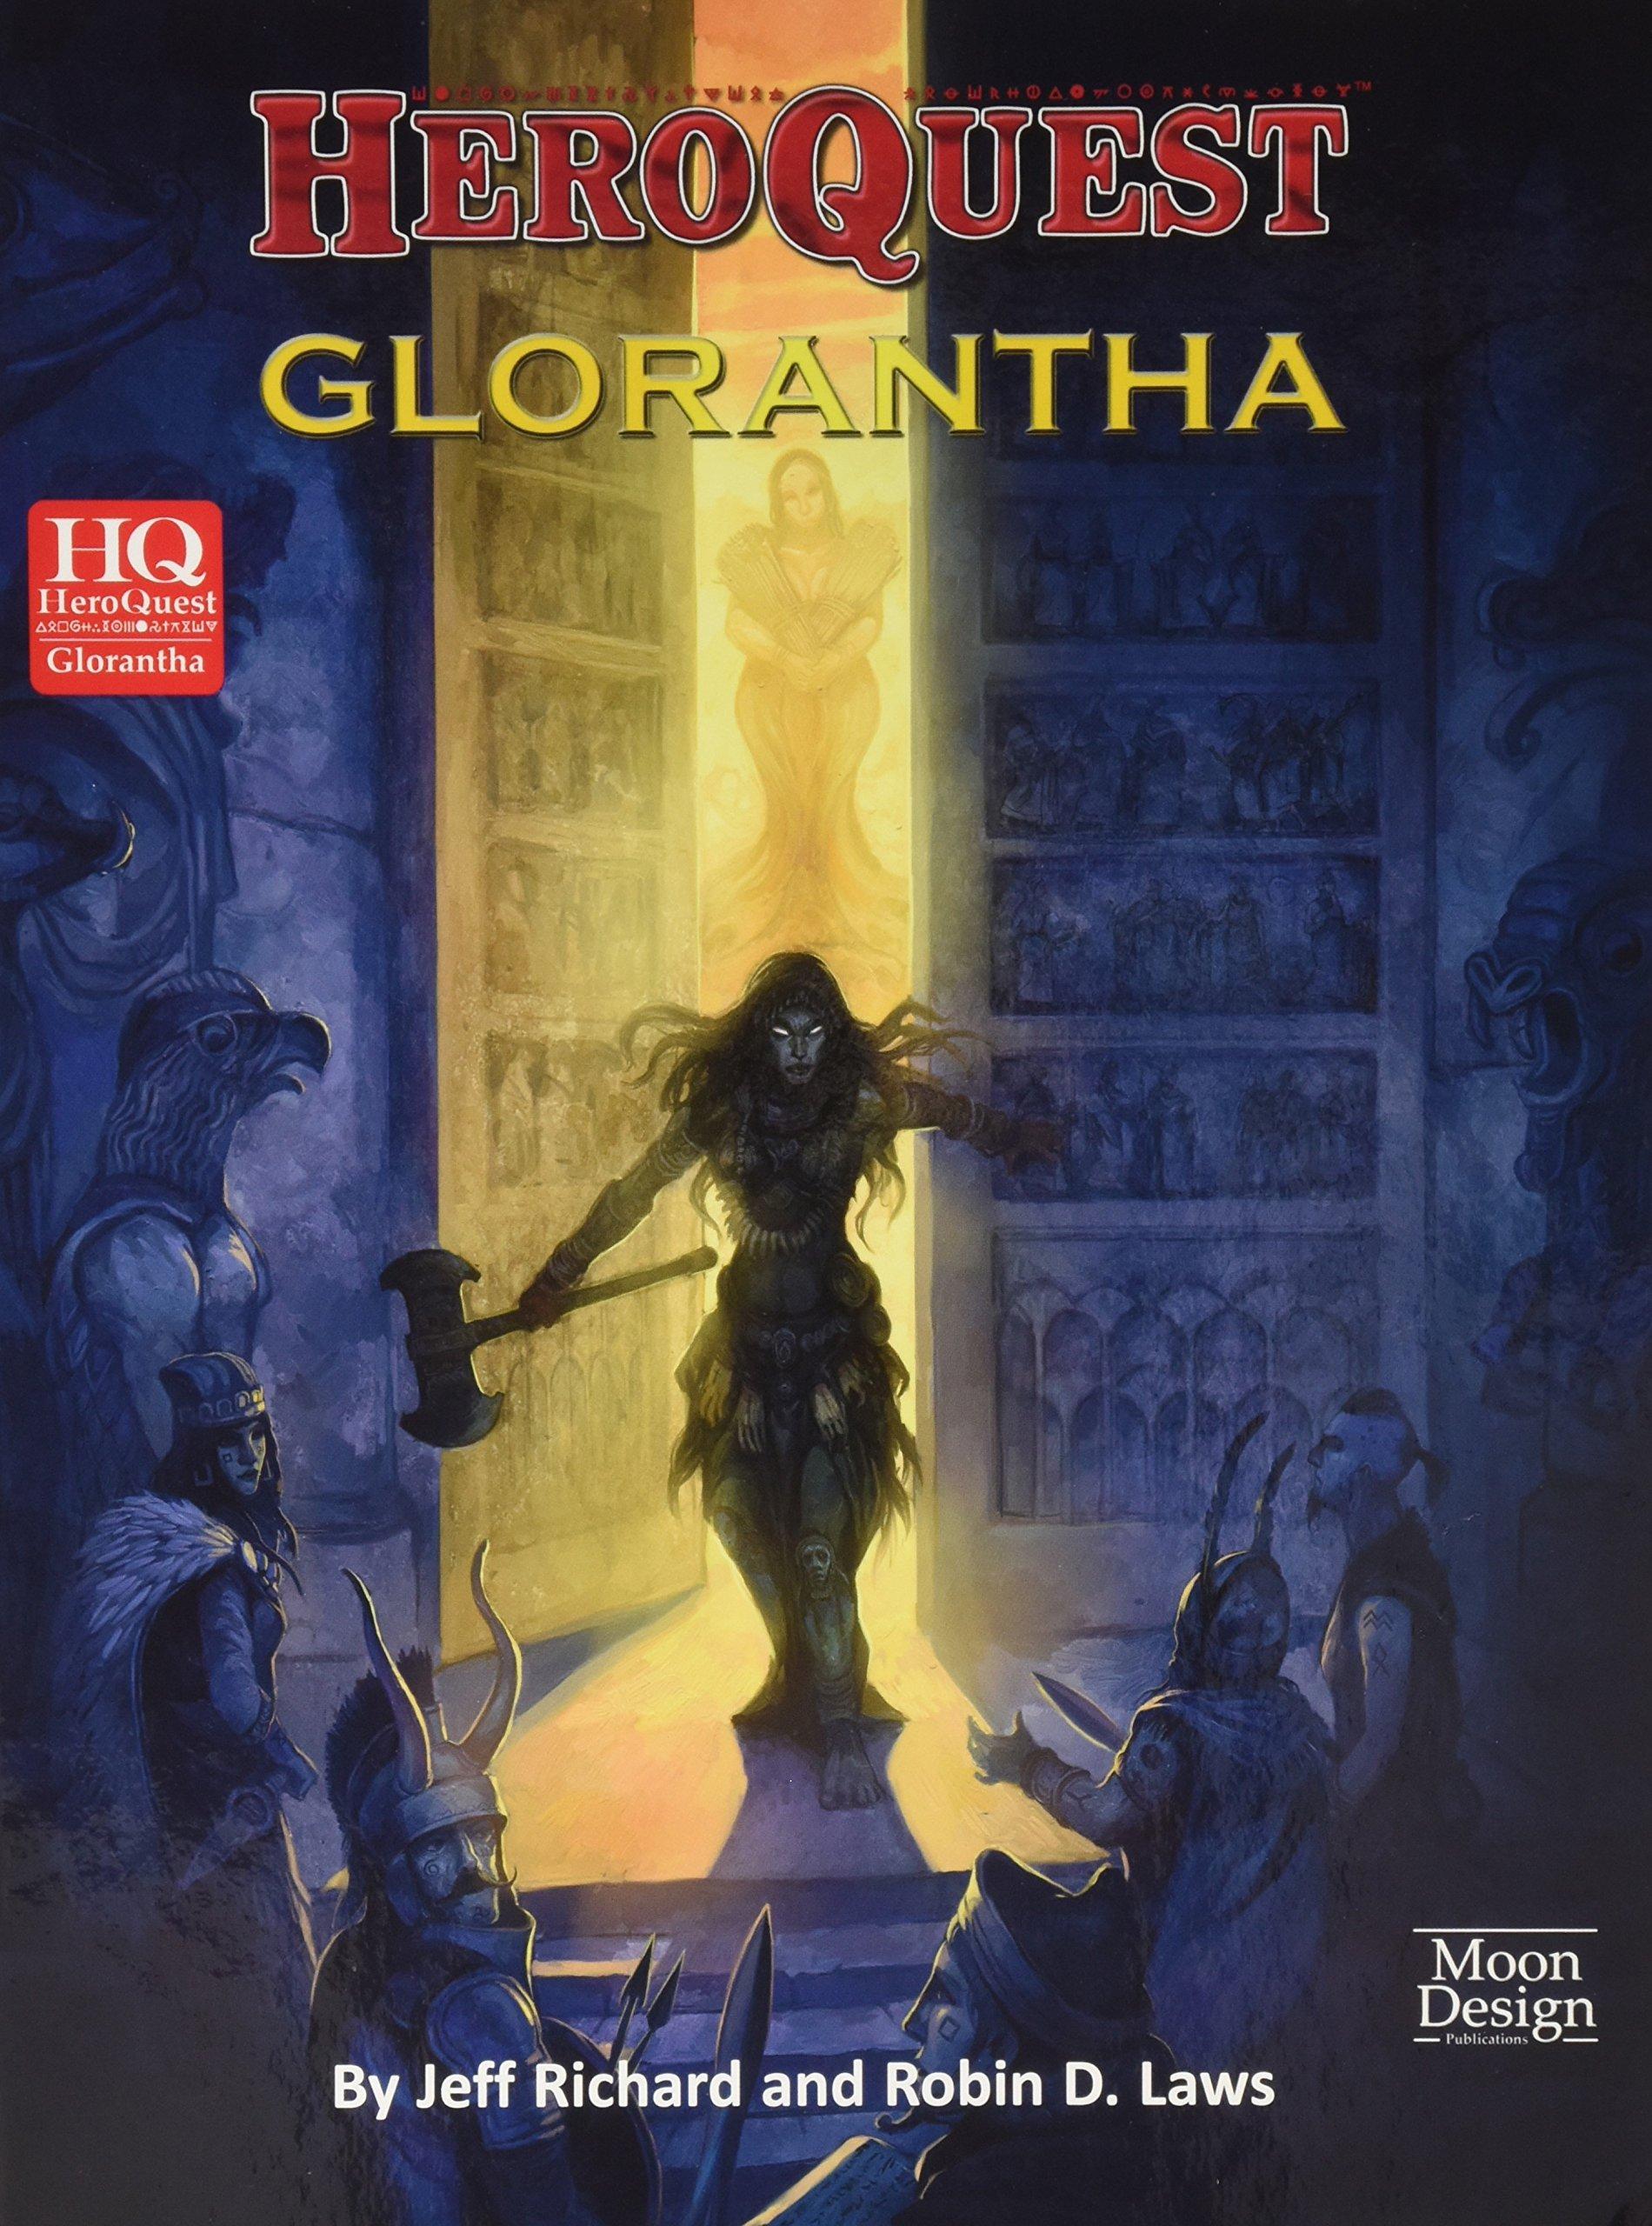 HEROQUEST GLORANTHA: Amazon.es: Richard, Jeff, Laws, Robin D.: Libros en idiomas extranjeros